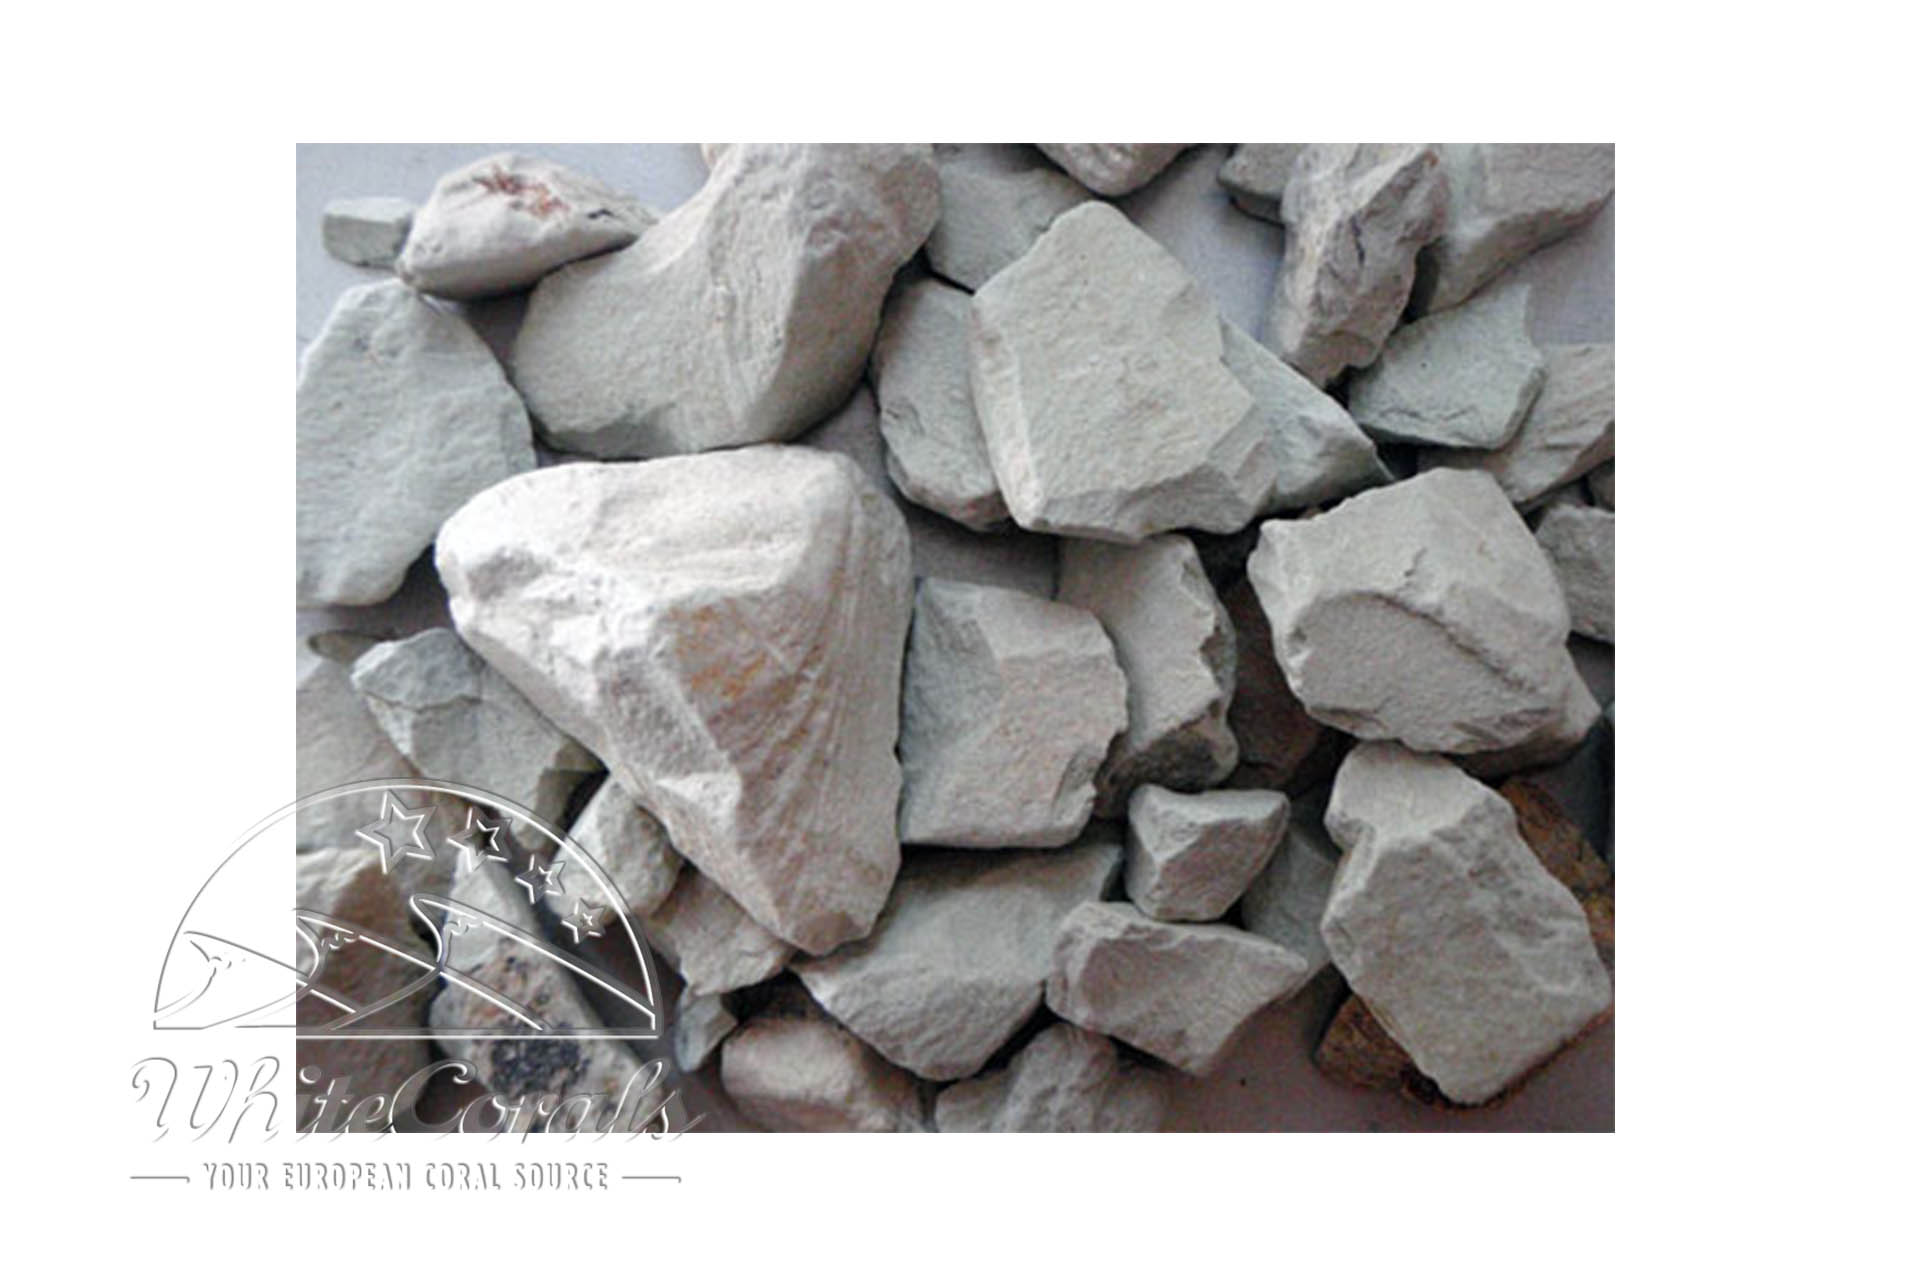 Sangokai kinko zeoklin 8-32 mm - 1000 g Zeolith